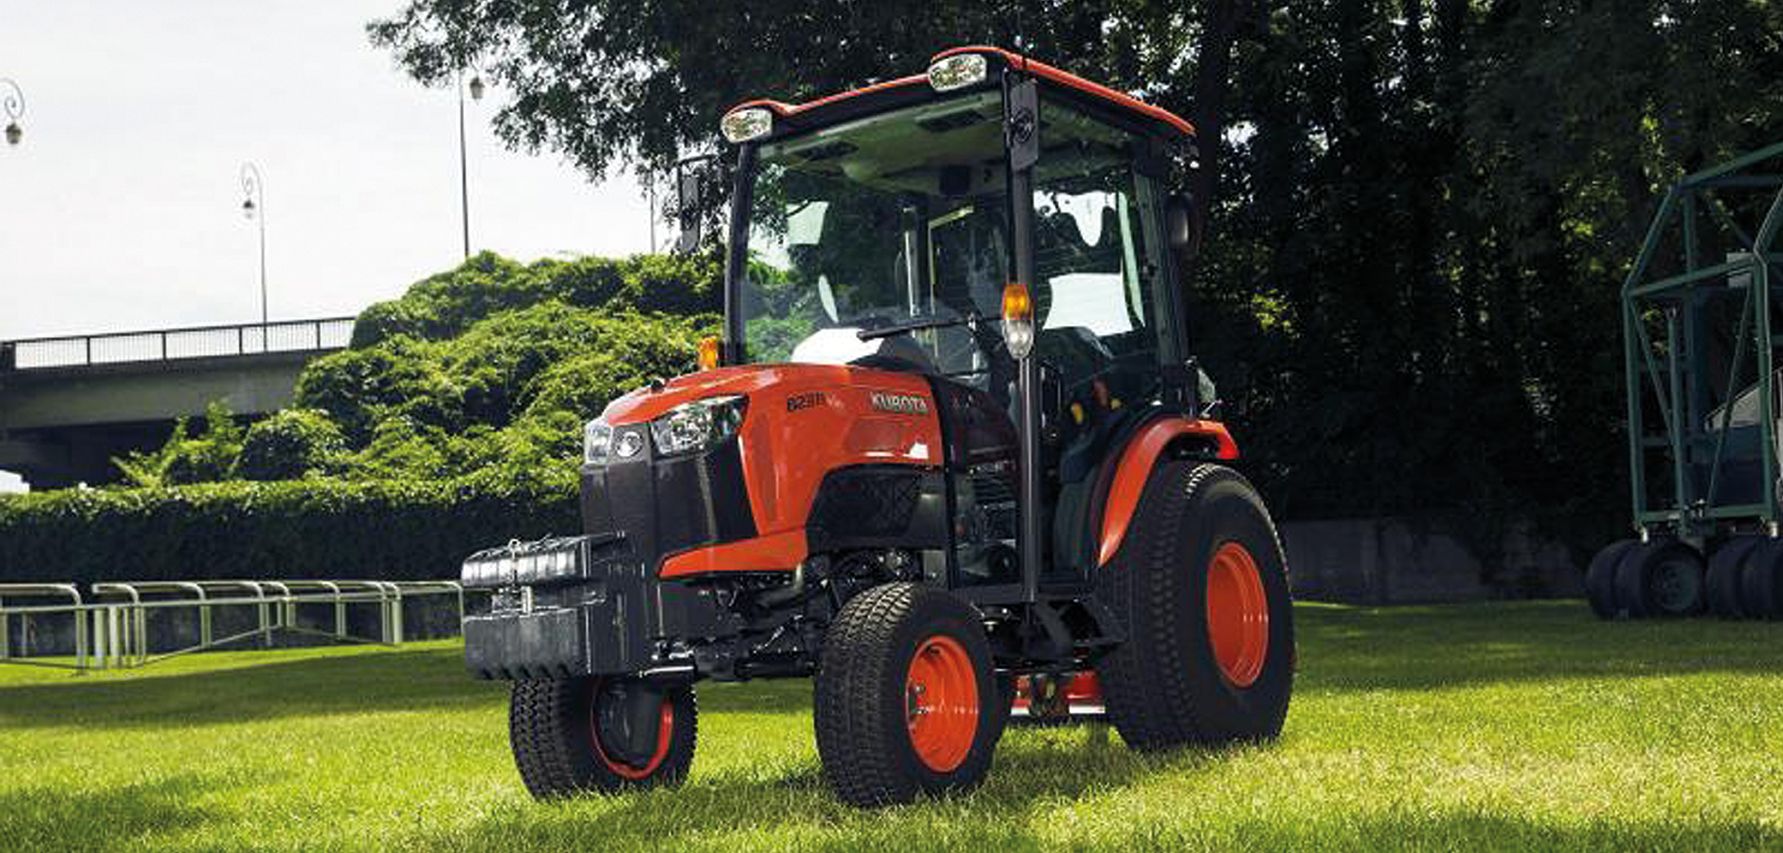 kubota shows its new b series compact tractors at lamma. Black Bedroom Furniture Sets. Home Design Ideas